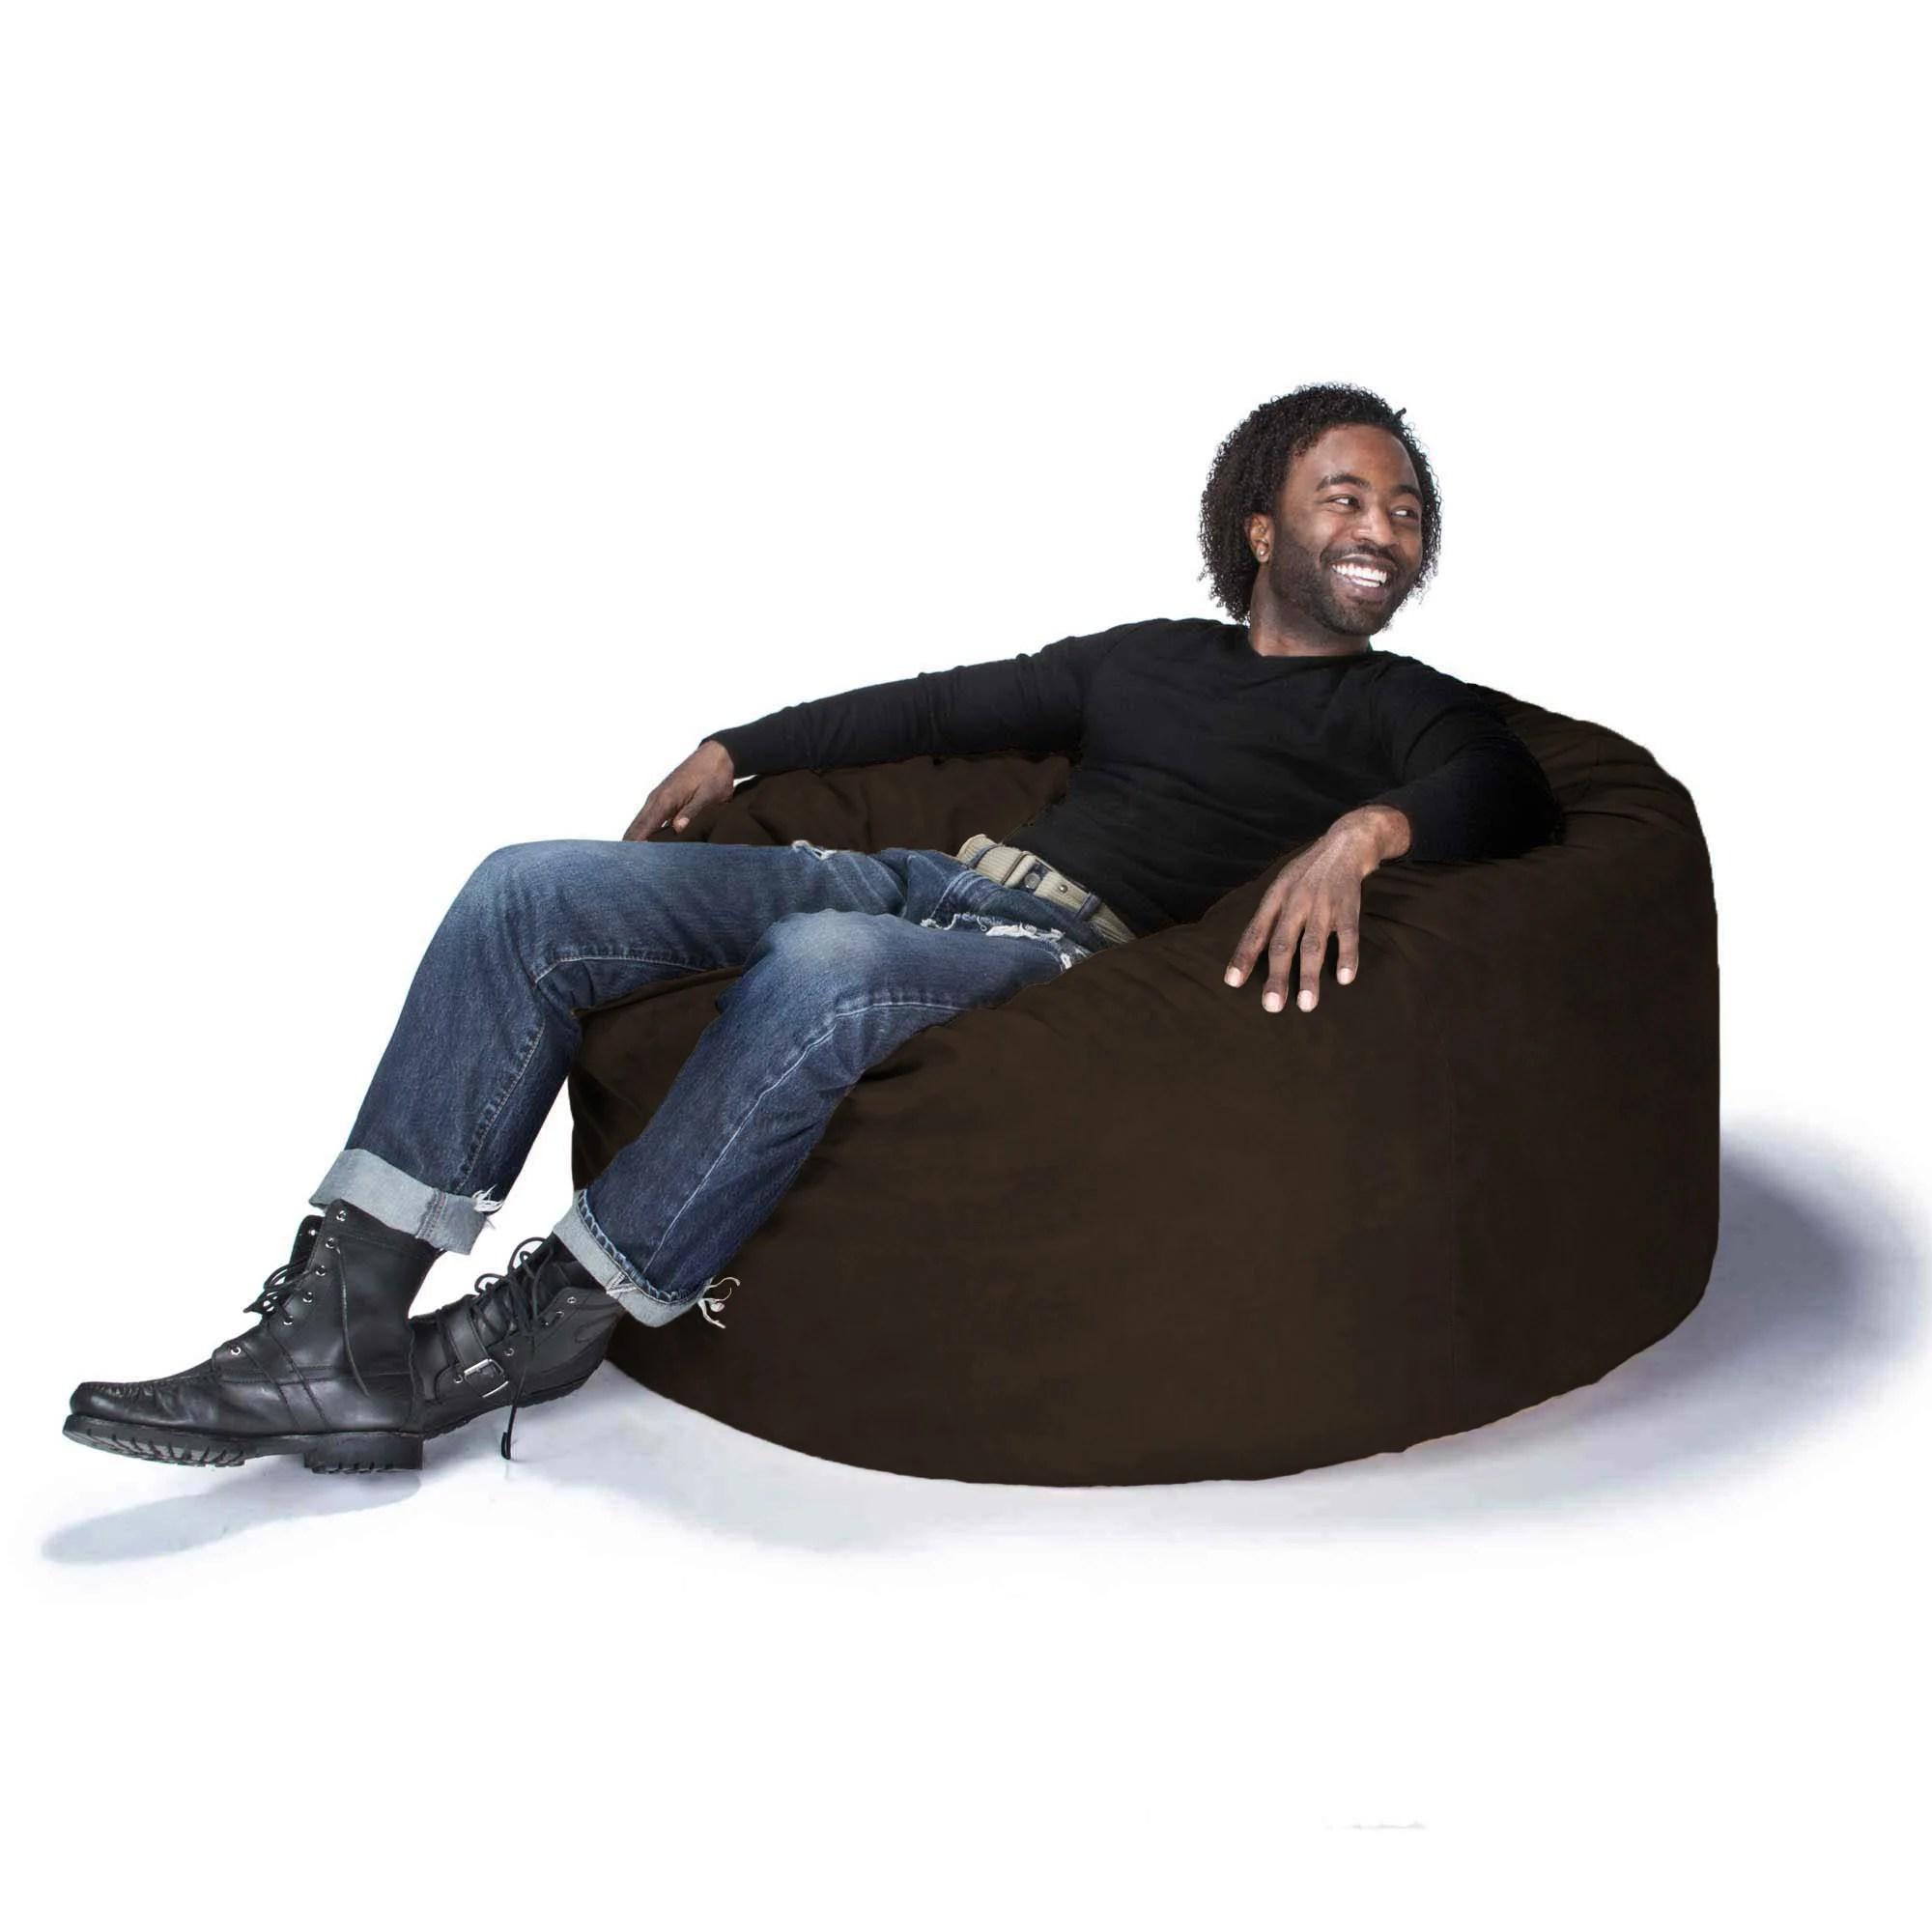 jaxx bean bag chair swivel patio chairs big lots large gaming and reviews wayfair